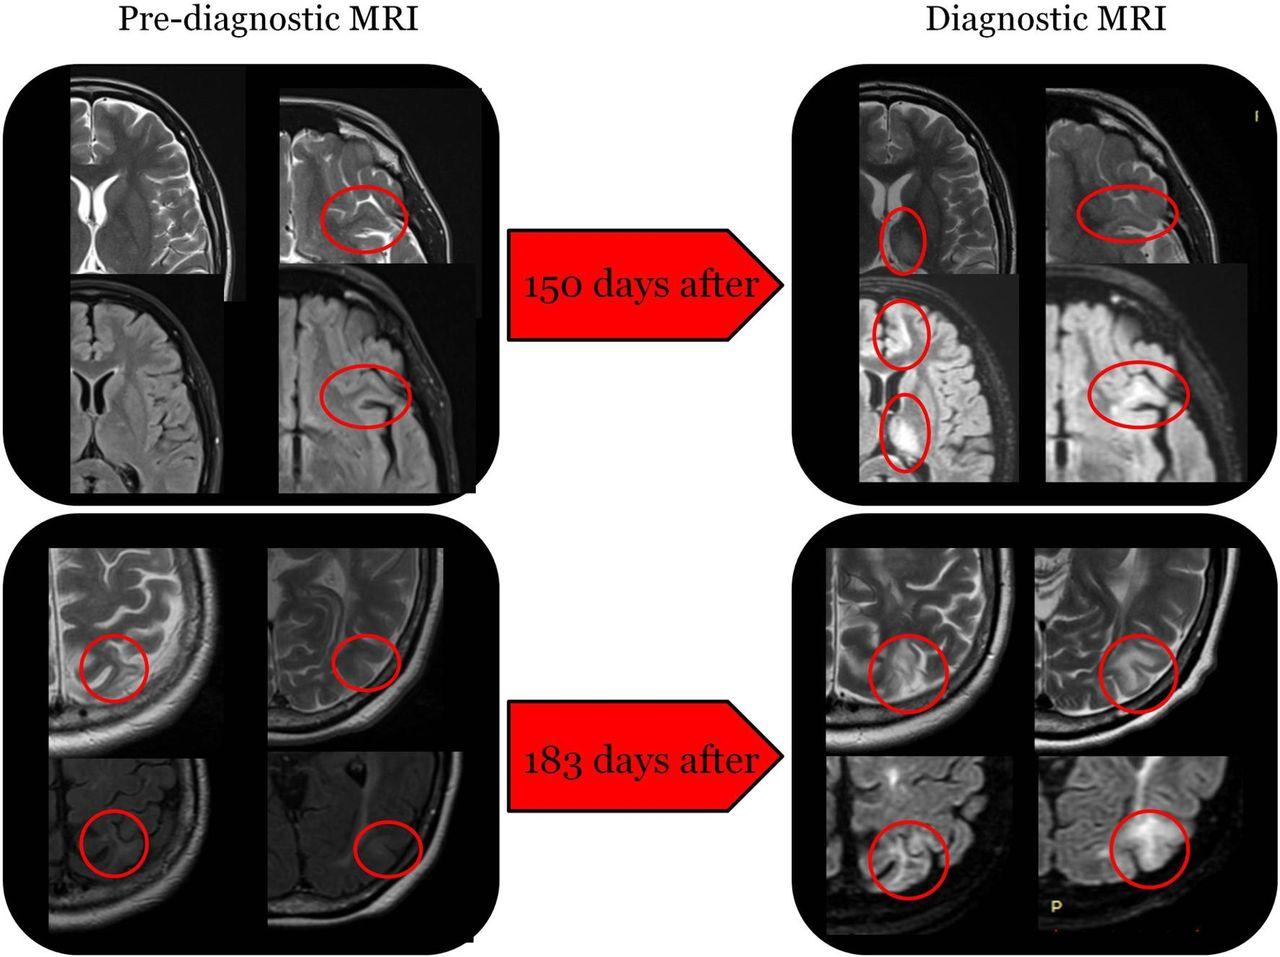 Early Diagnosis Of Progressive Multifocal Leucoencephalopathy